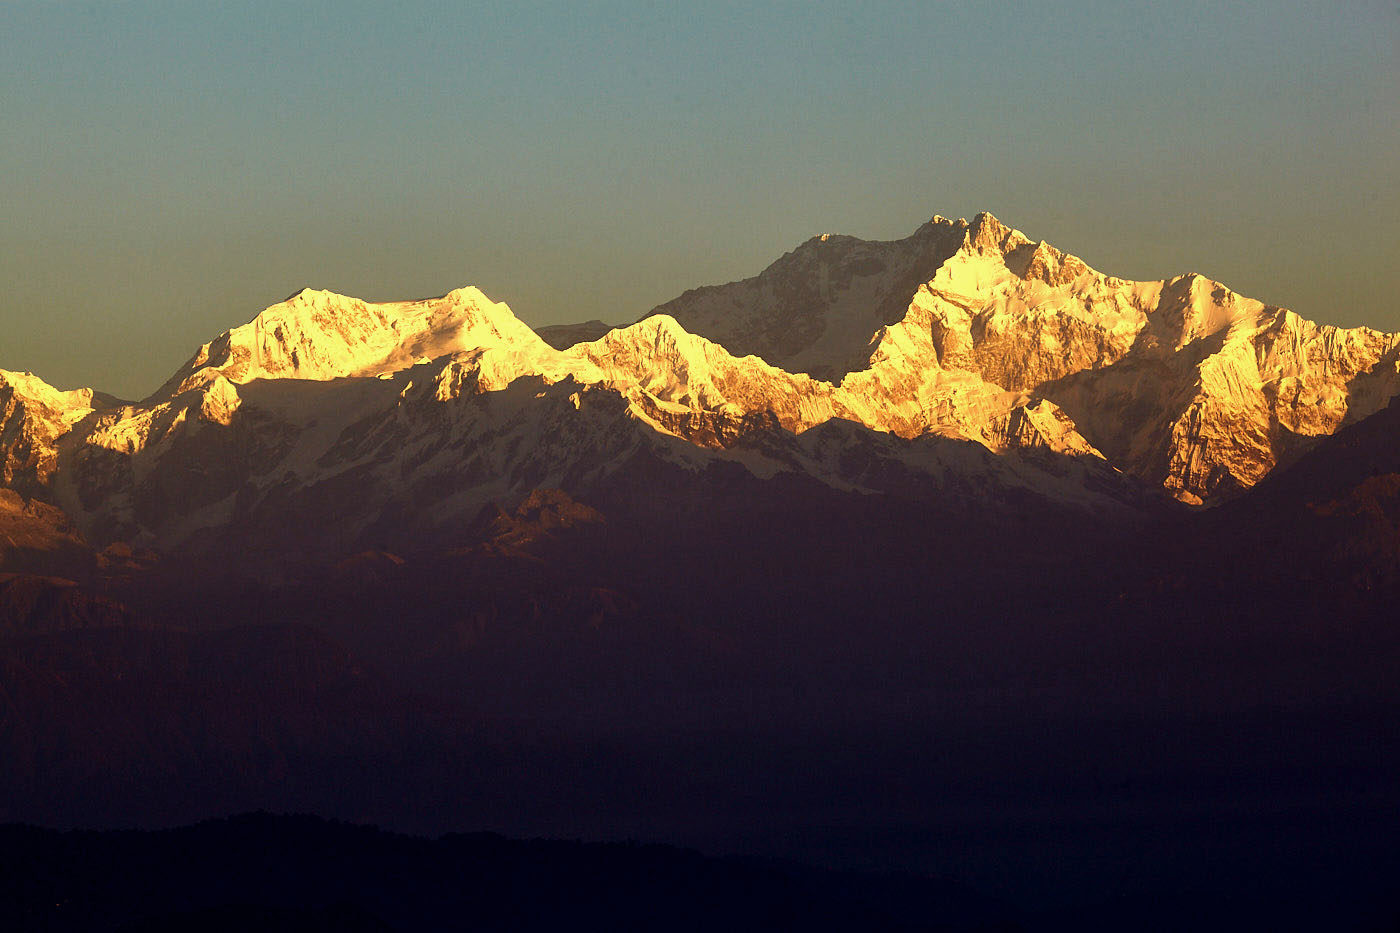 Darjeeling: Mantra for the morning